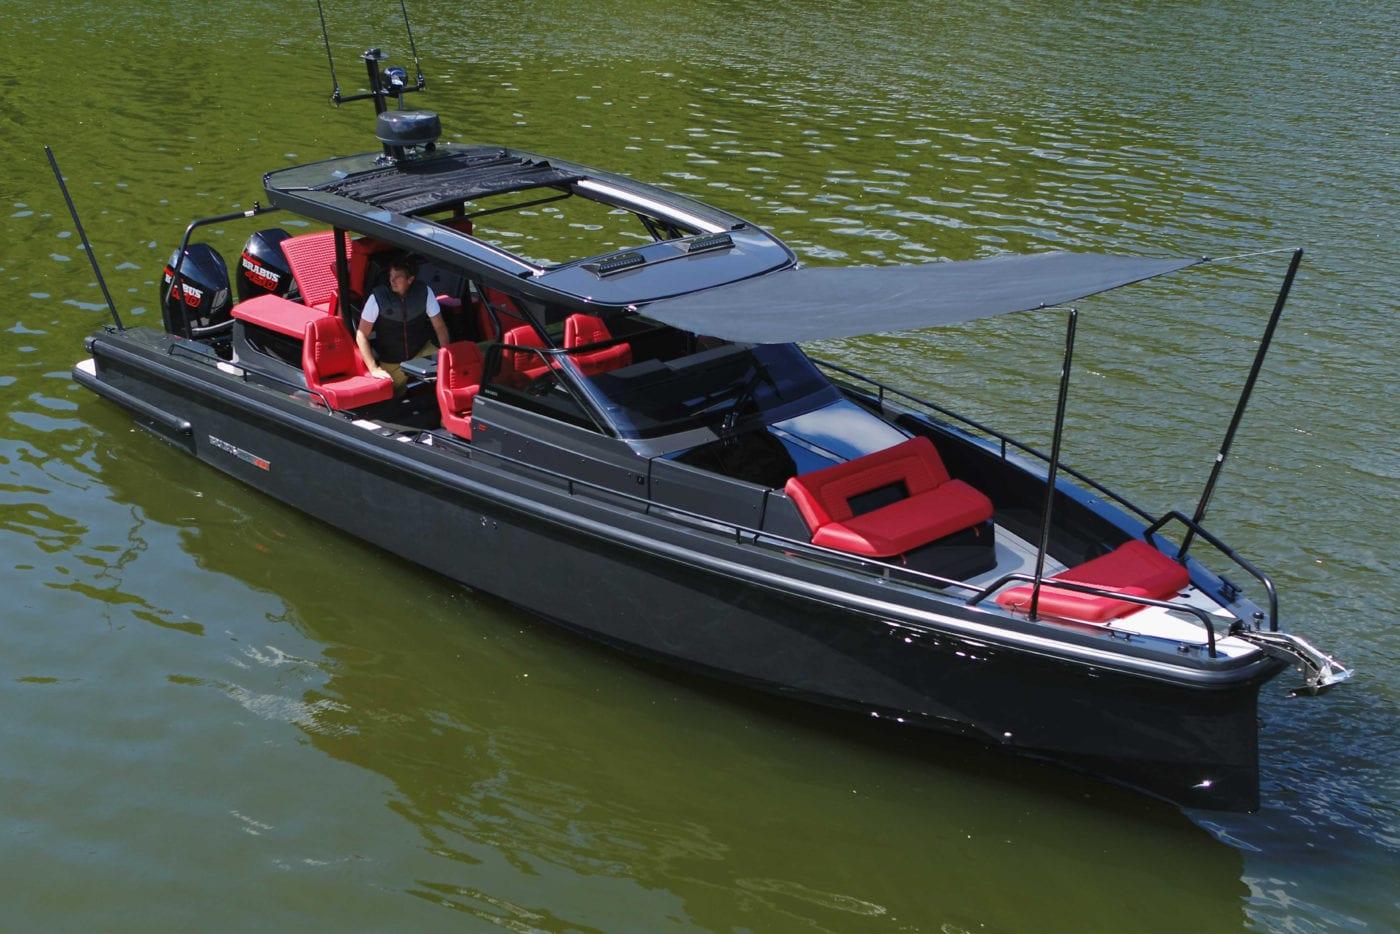 brabus 900 boat